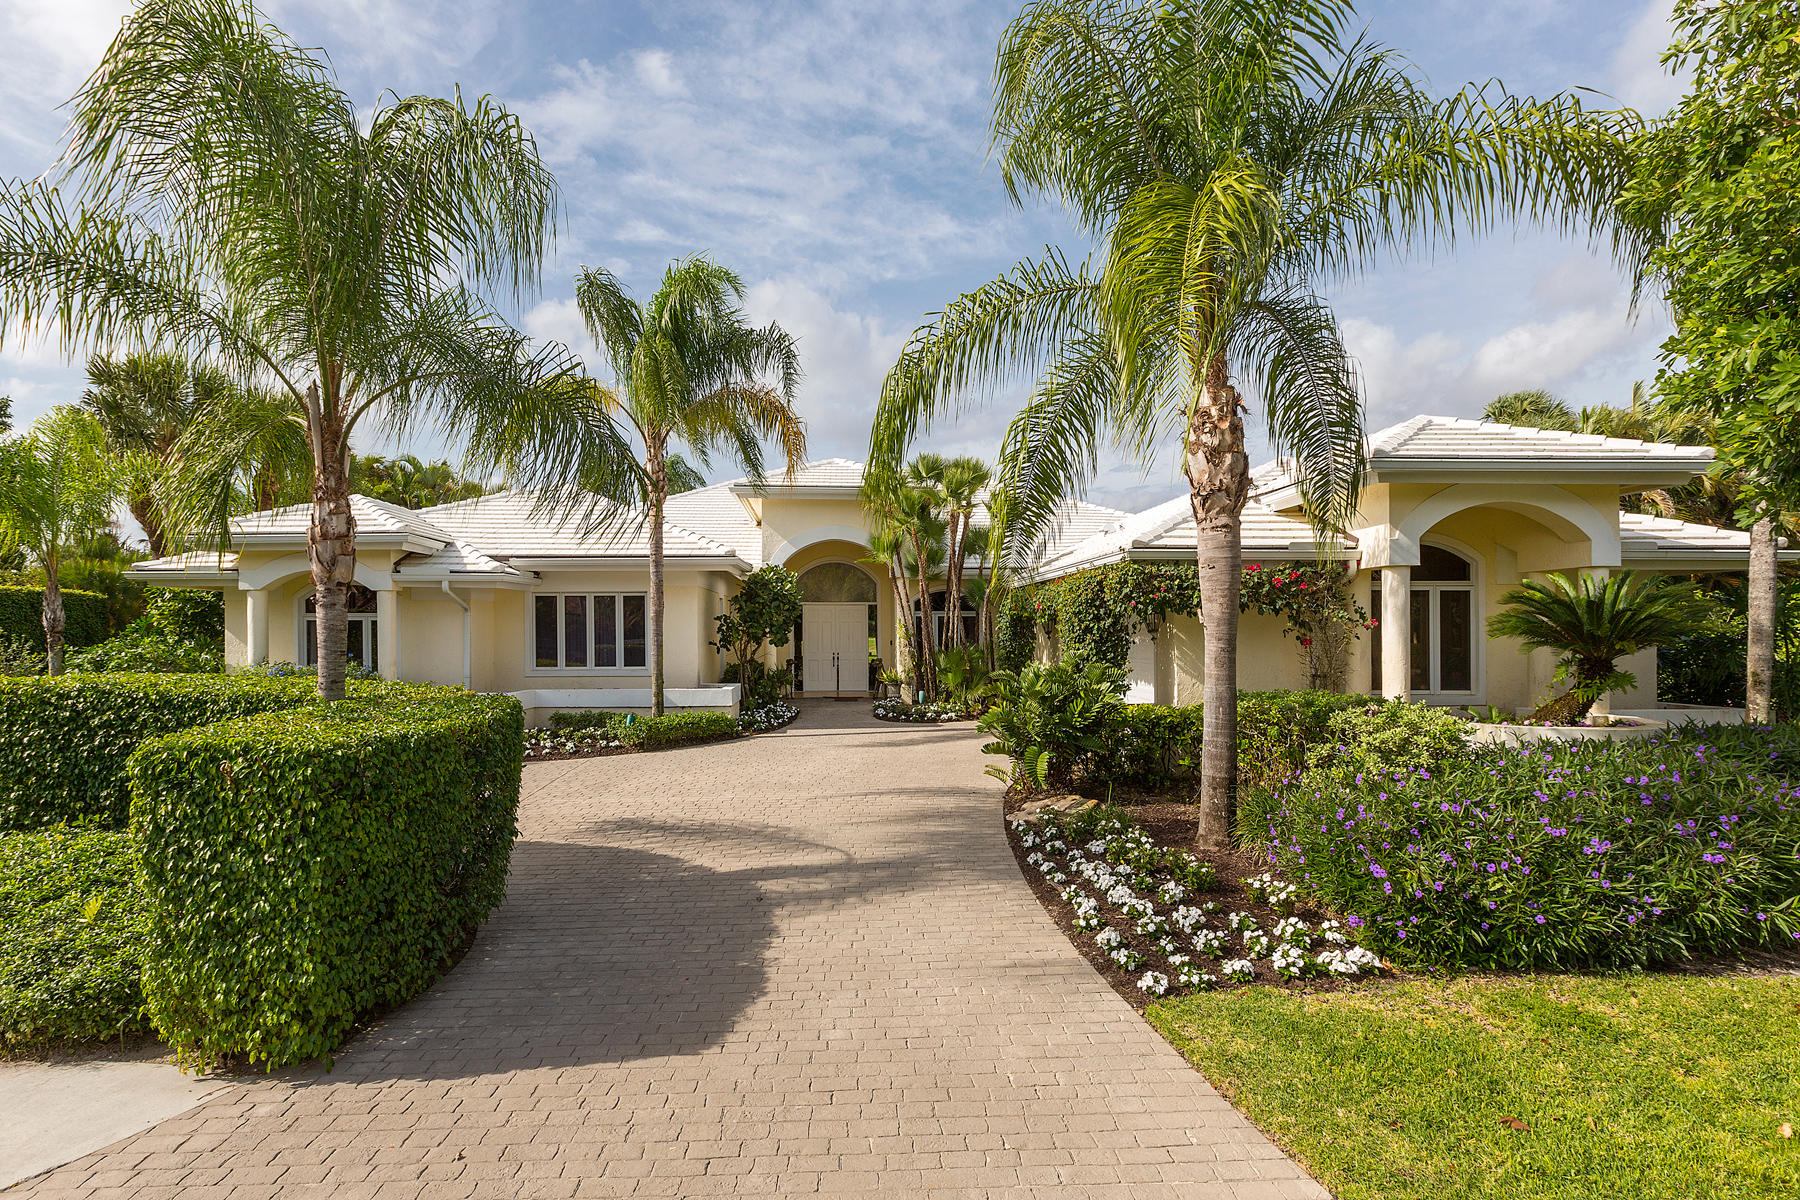 2579 Fairway Island Drive, Wellington, Florida 33414, 5 Bedrooms Bedrooms, ,5.1 BathroomsBathrooms,Single Family,For Sale,PALM BEACH POLO,Fairway Island,RX-10490592